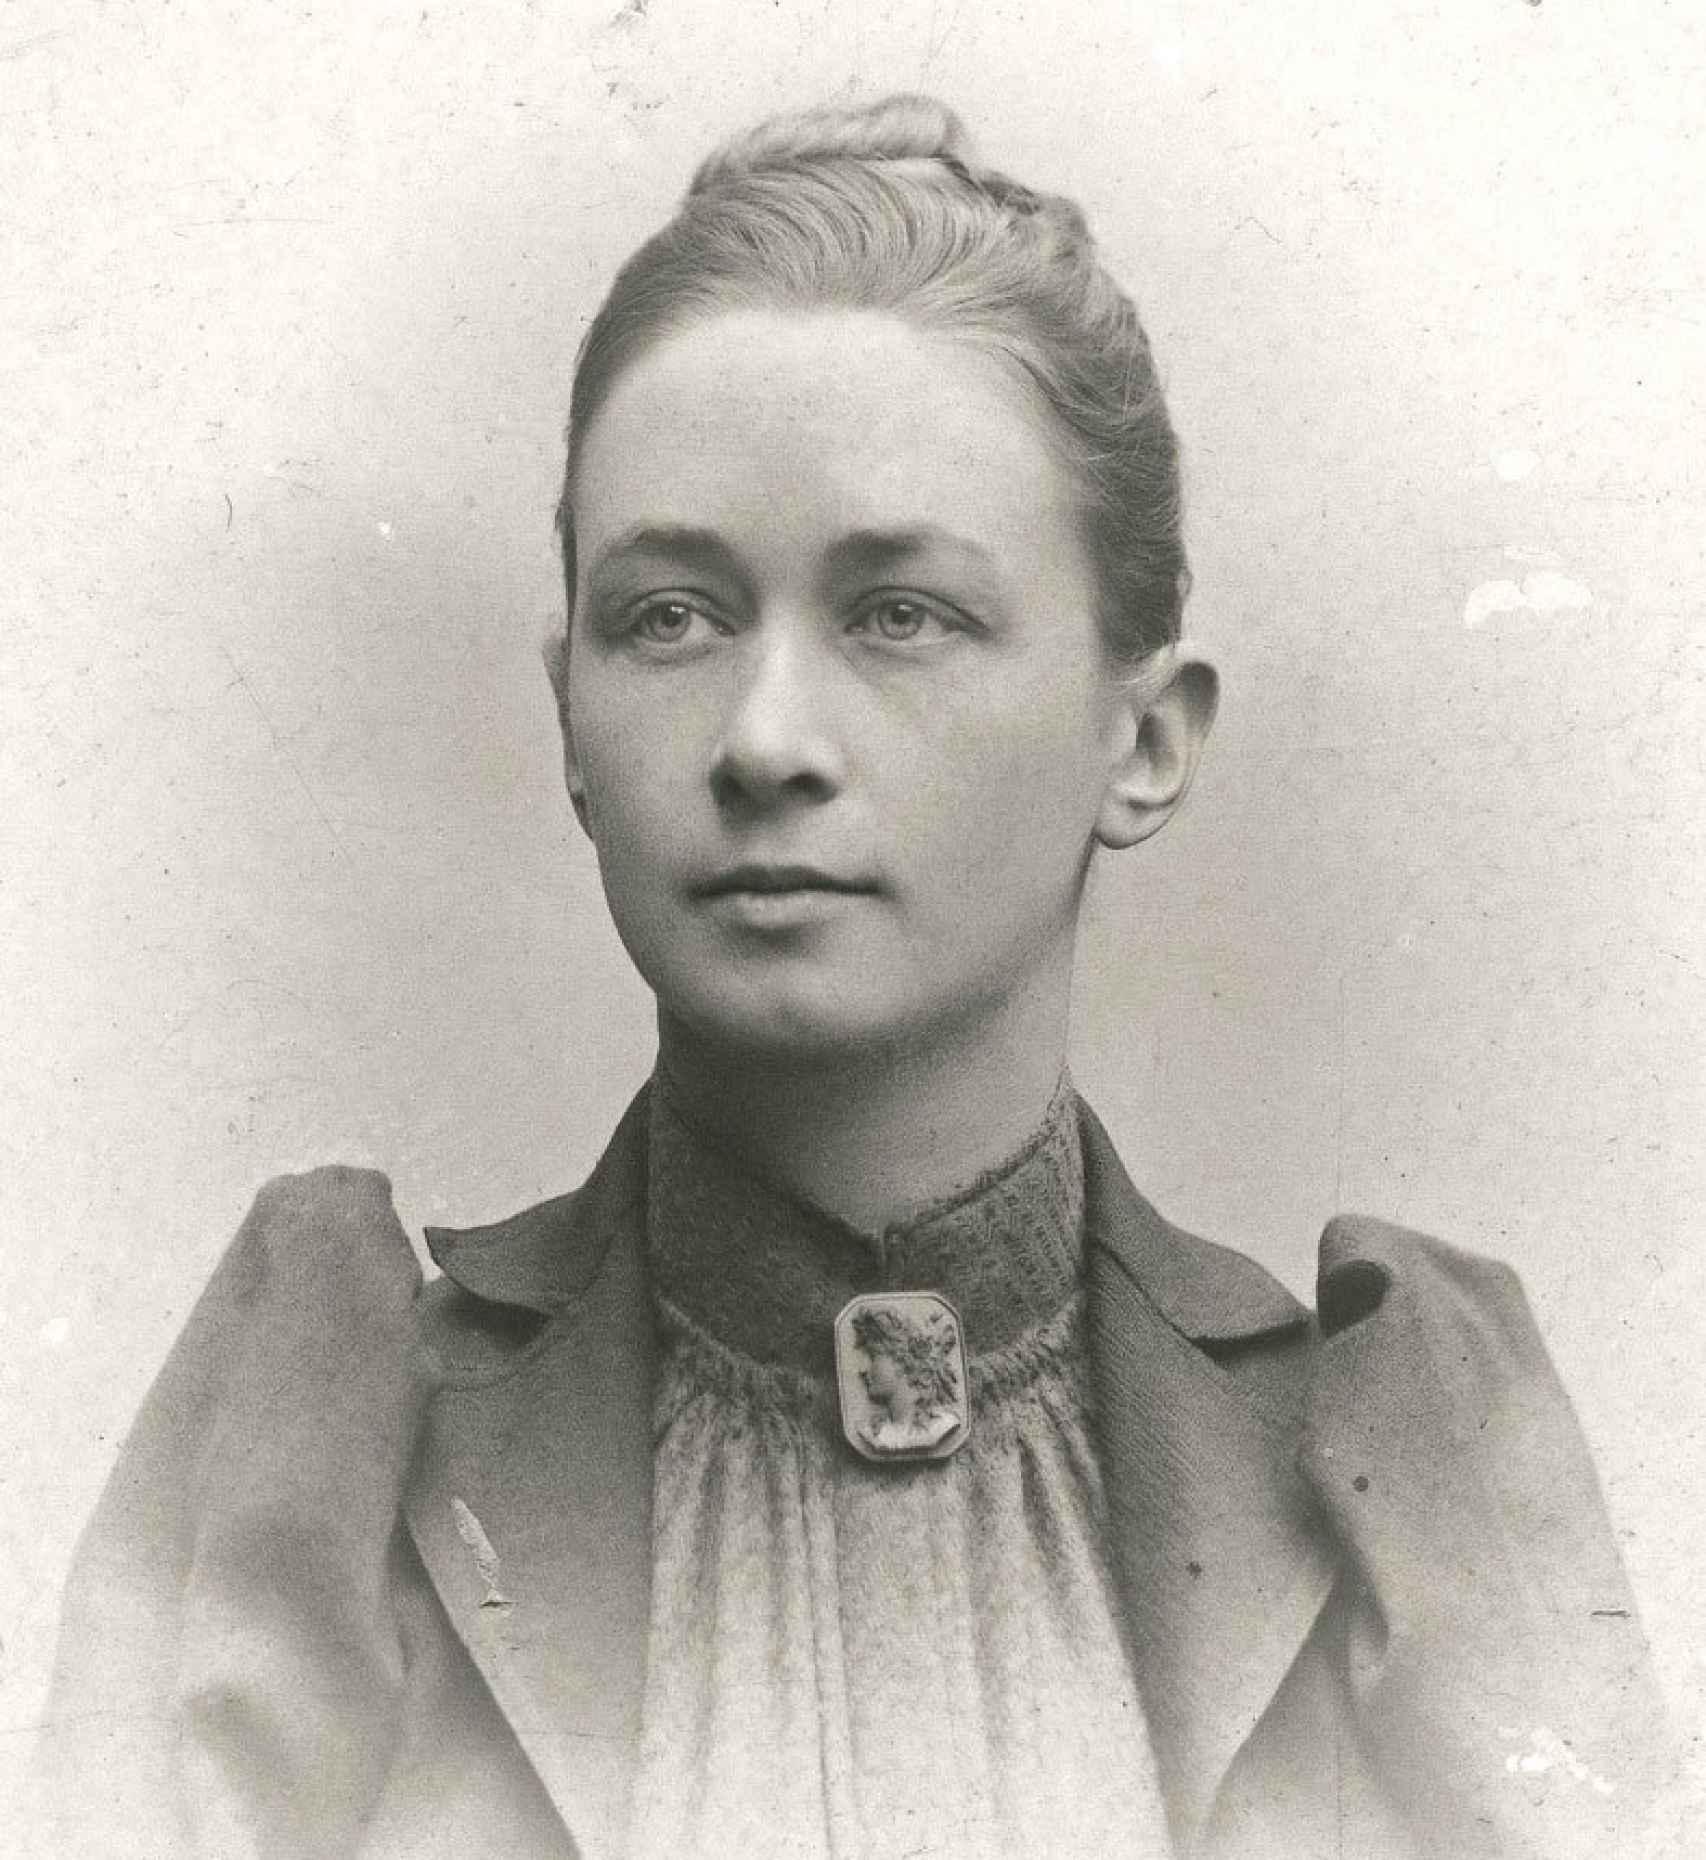 La pintora Hilma af Klint.